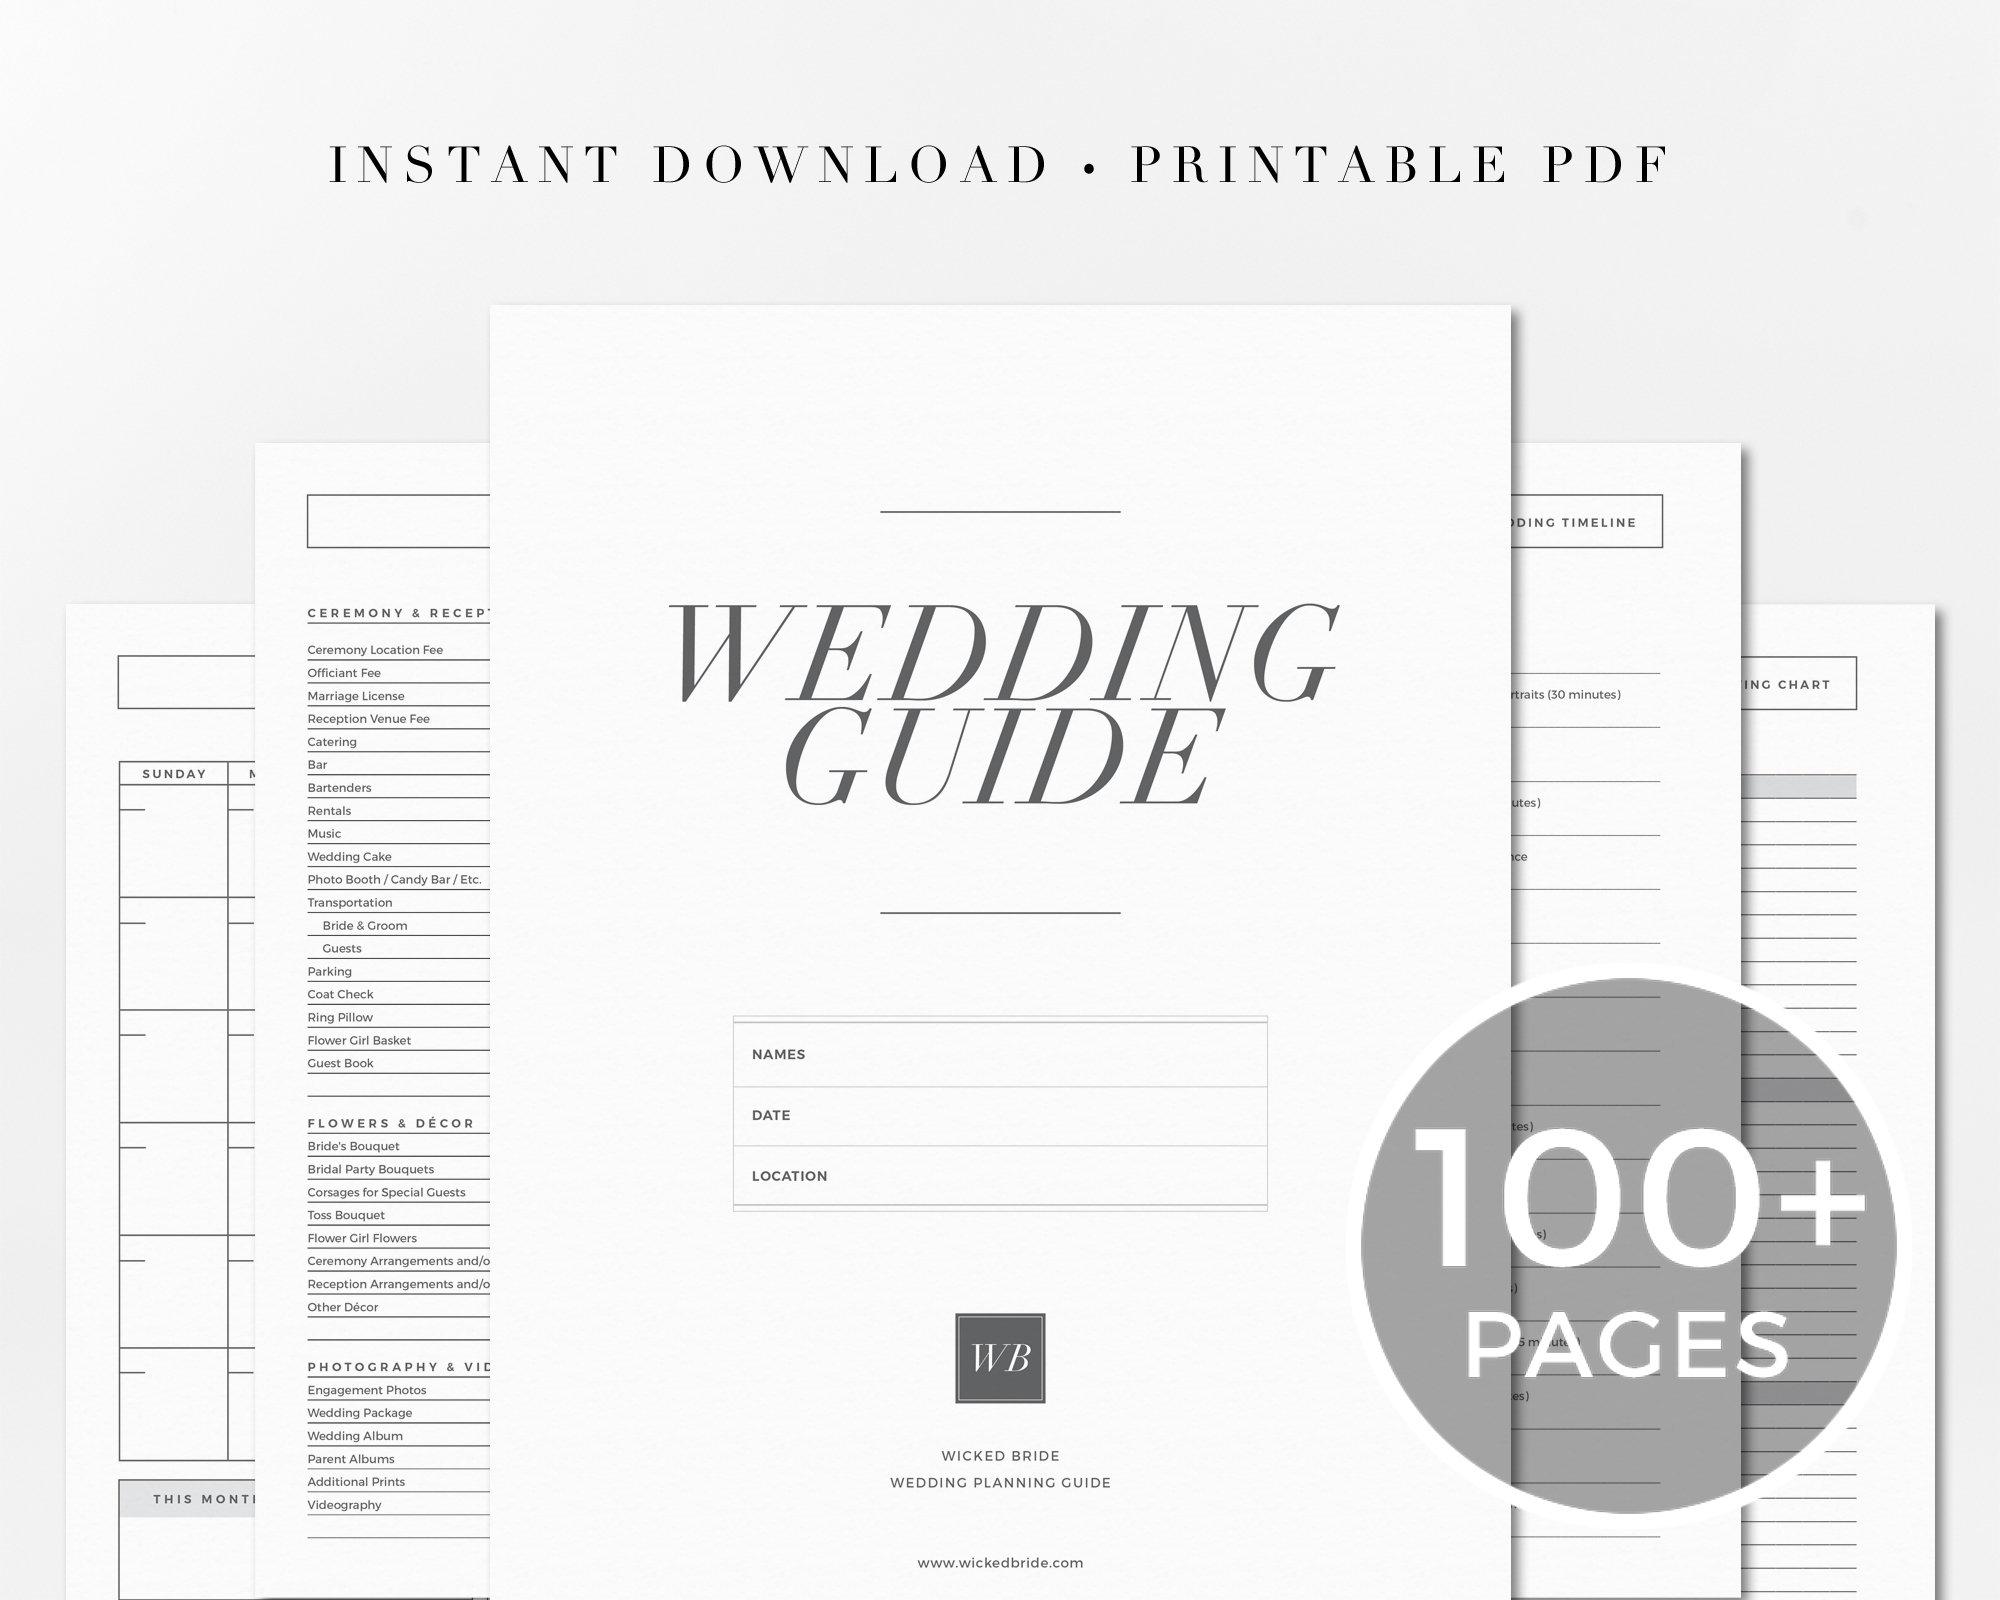 Printable Wedding Planner, Wedding Planning Book, Wedding Binder Template,  Wedding Organizer, Engagement Gift, Instant Download, 100 pages